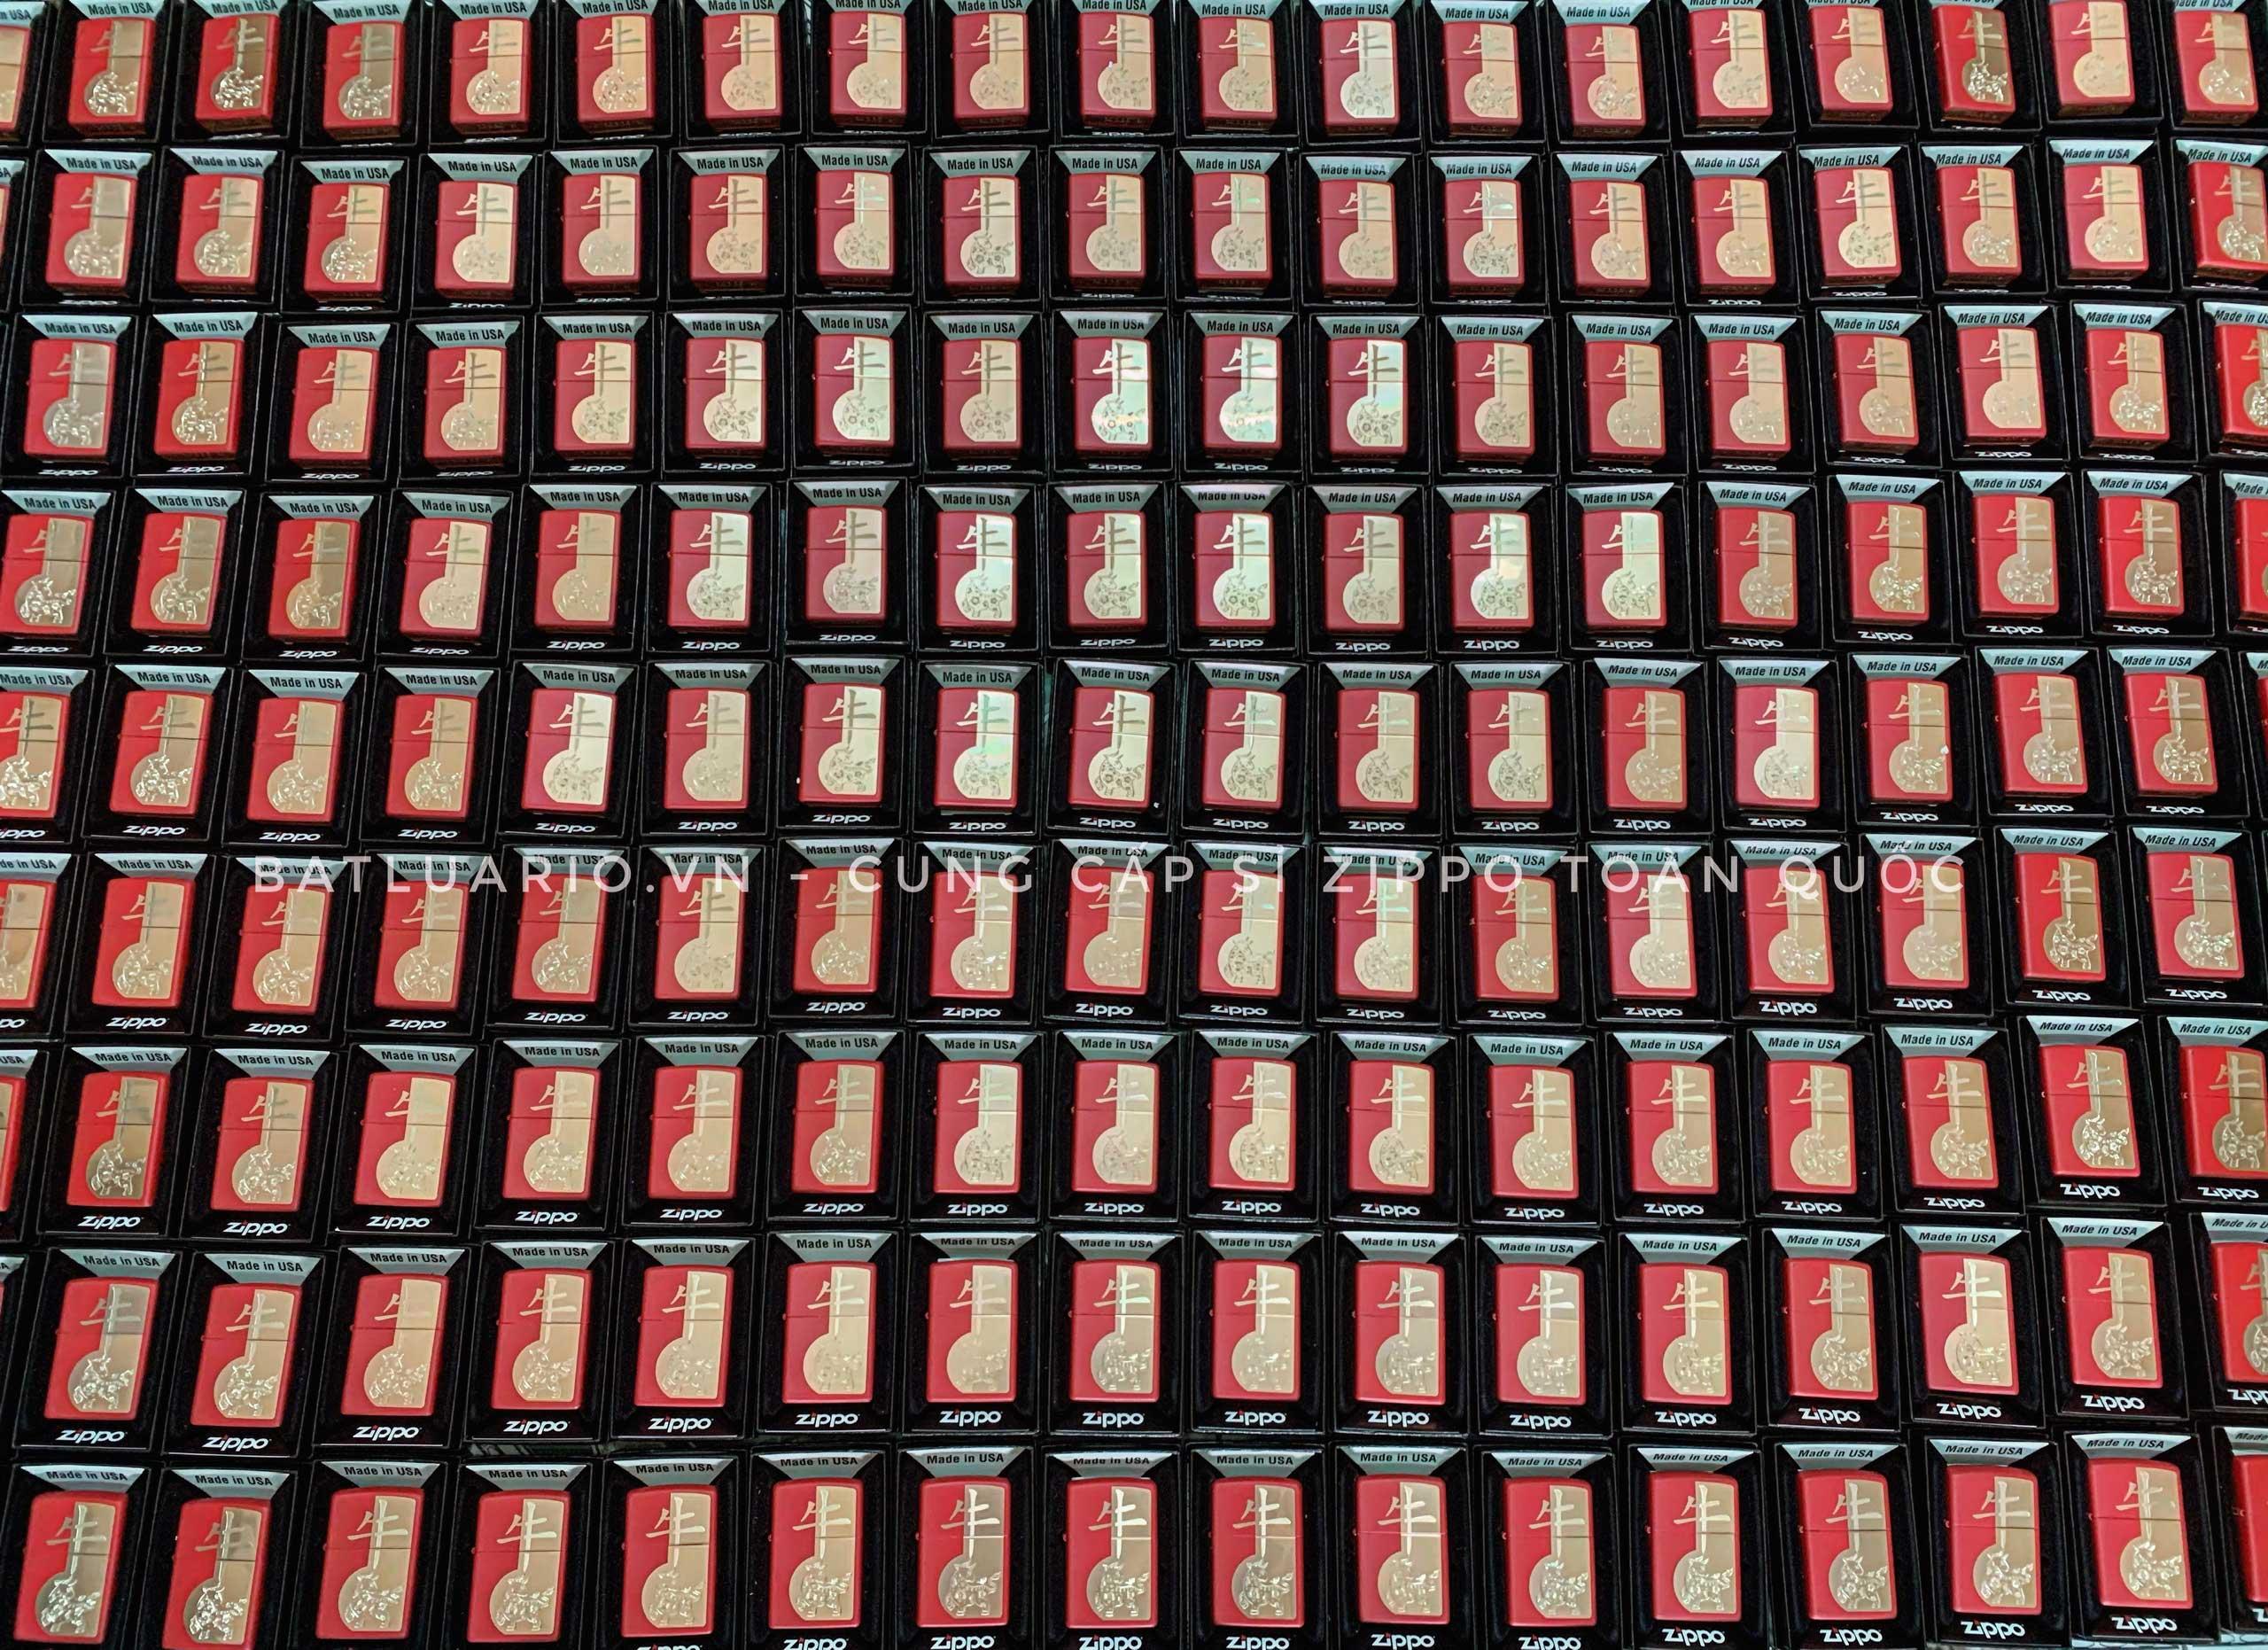 Zippo 49233 - Zippo Year of the Ox Red Matte 10